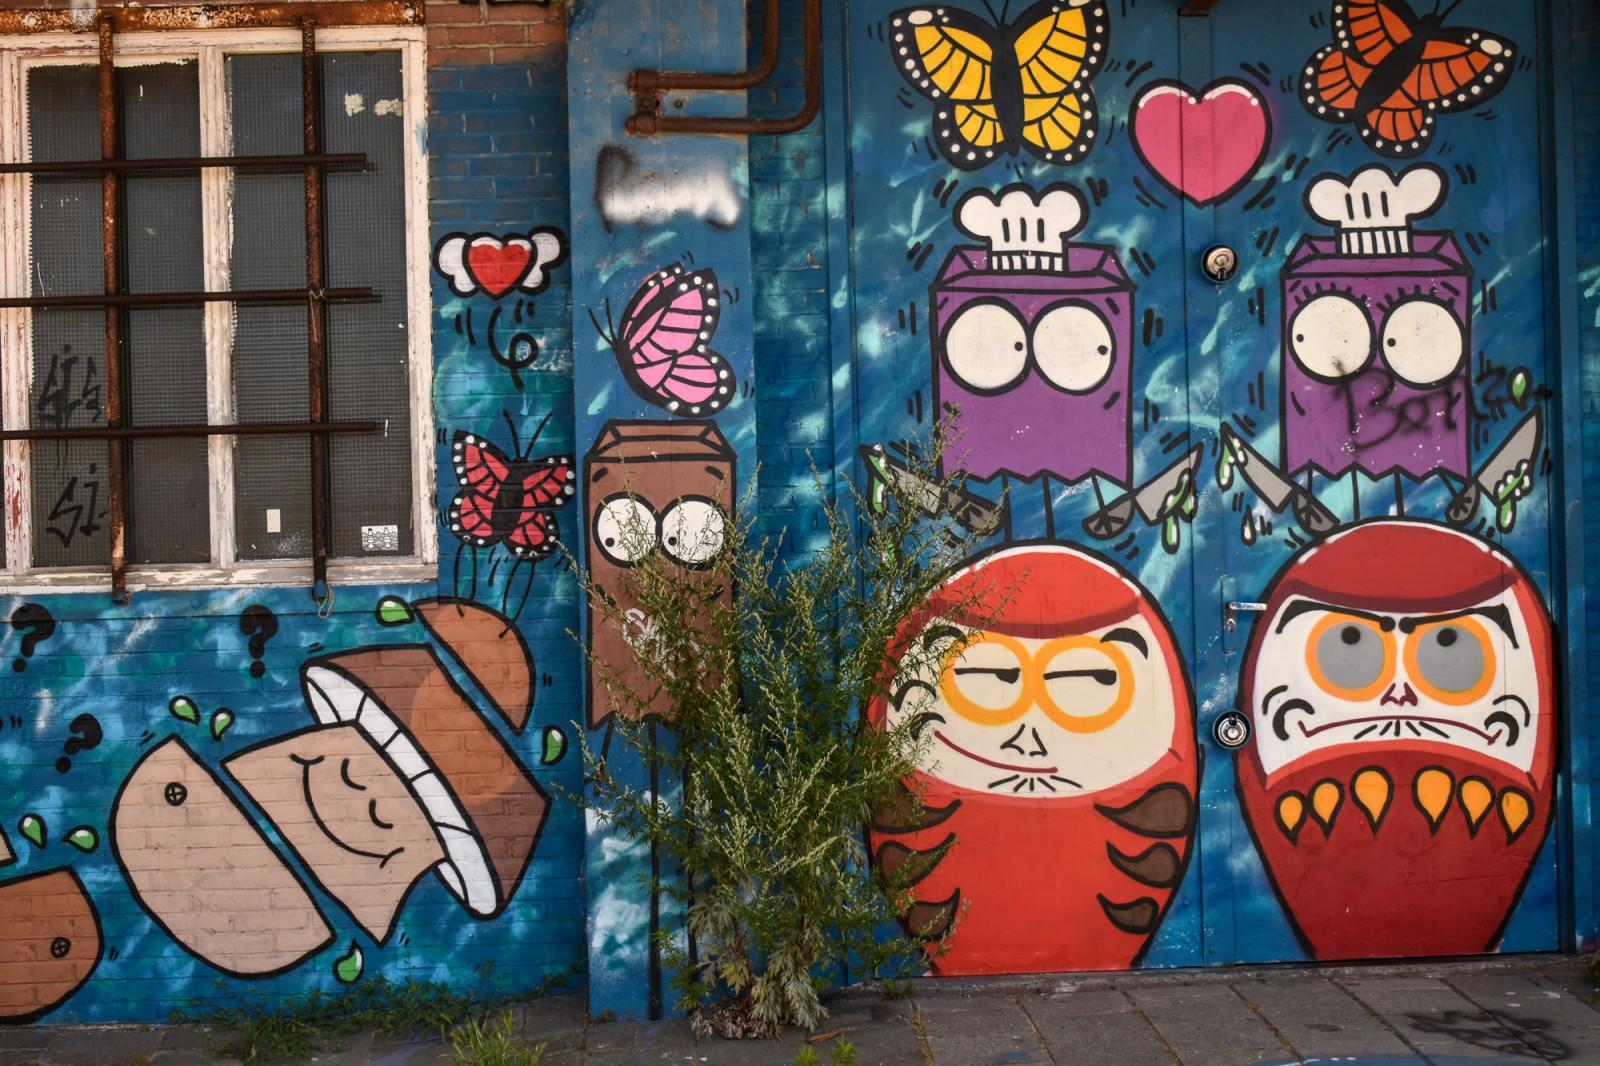 Cool urban street art in Amsterdam